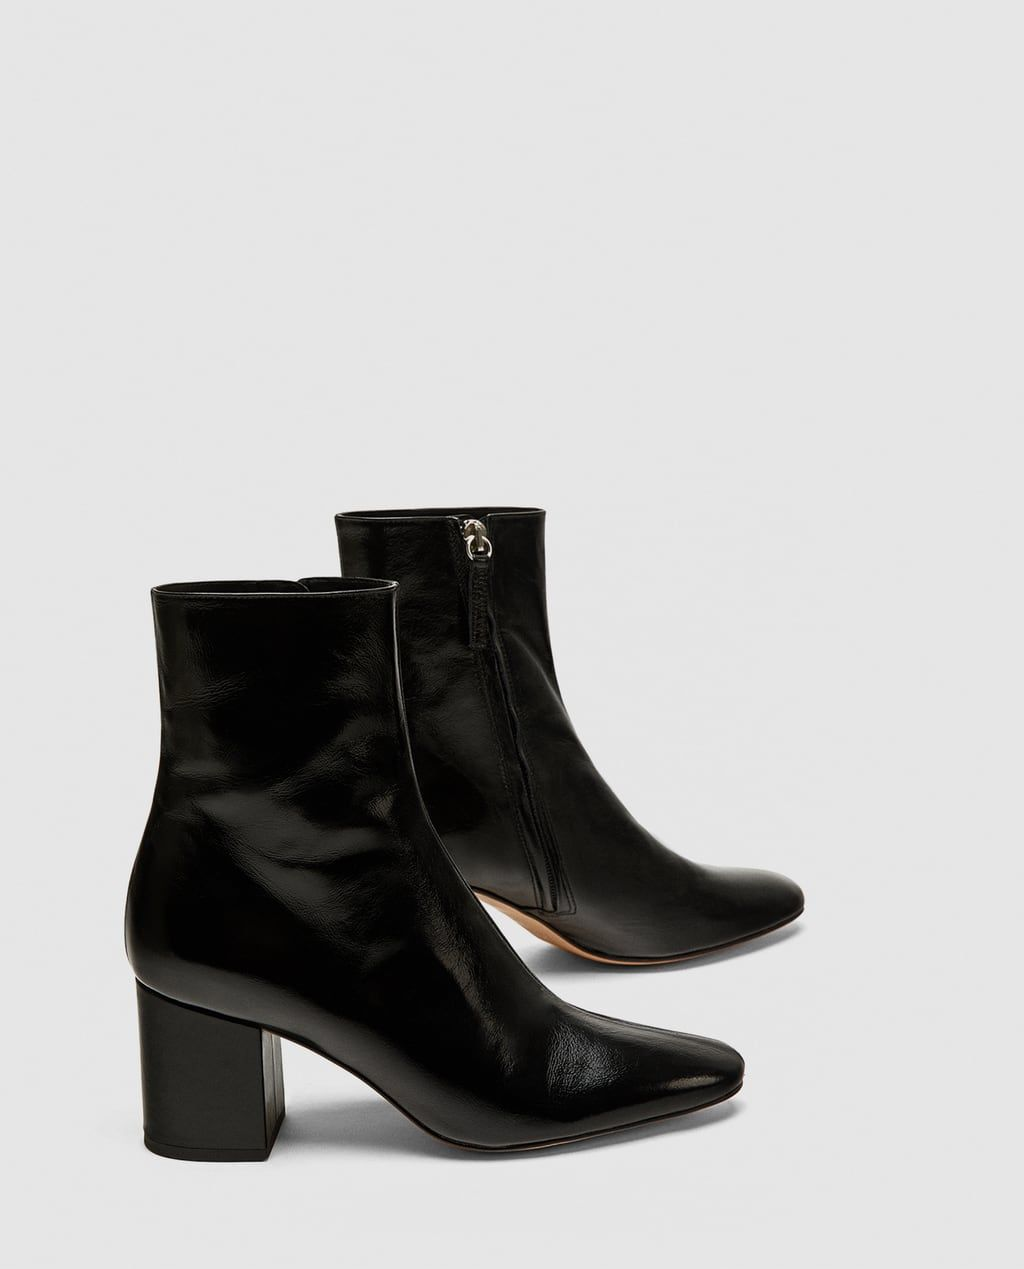 BOTÍN TACÓN PIEL in 2019 | High heel stiefel, Stiefeletten